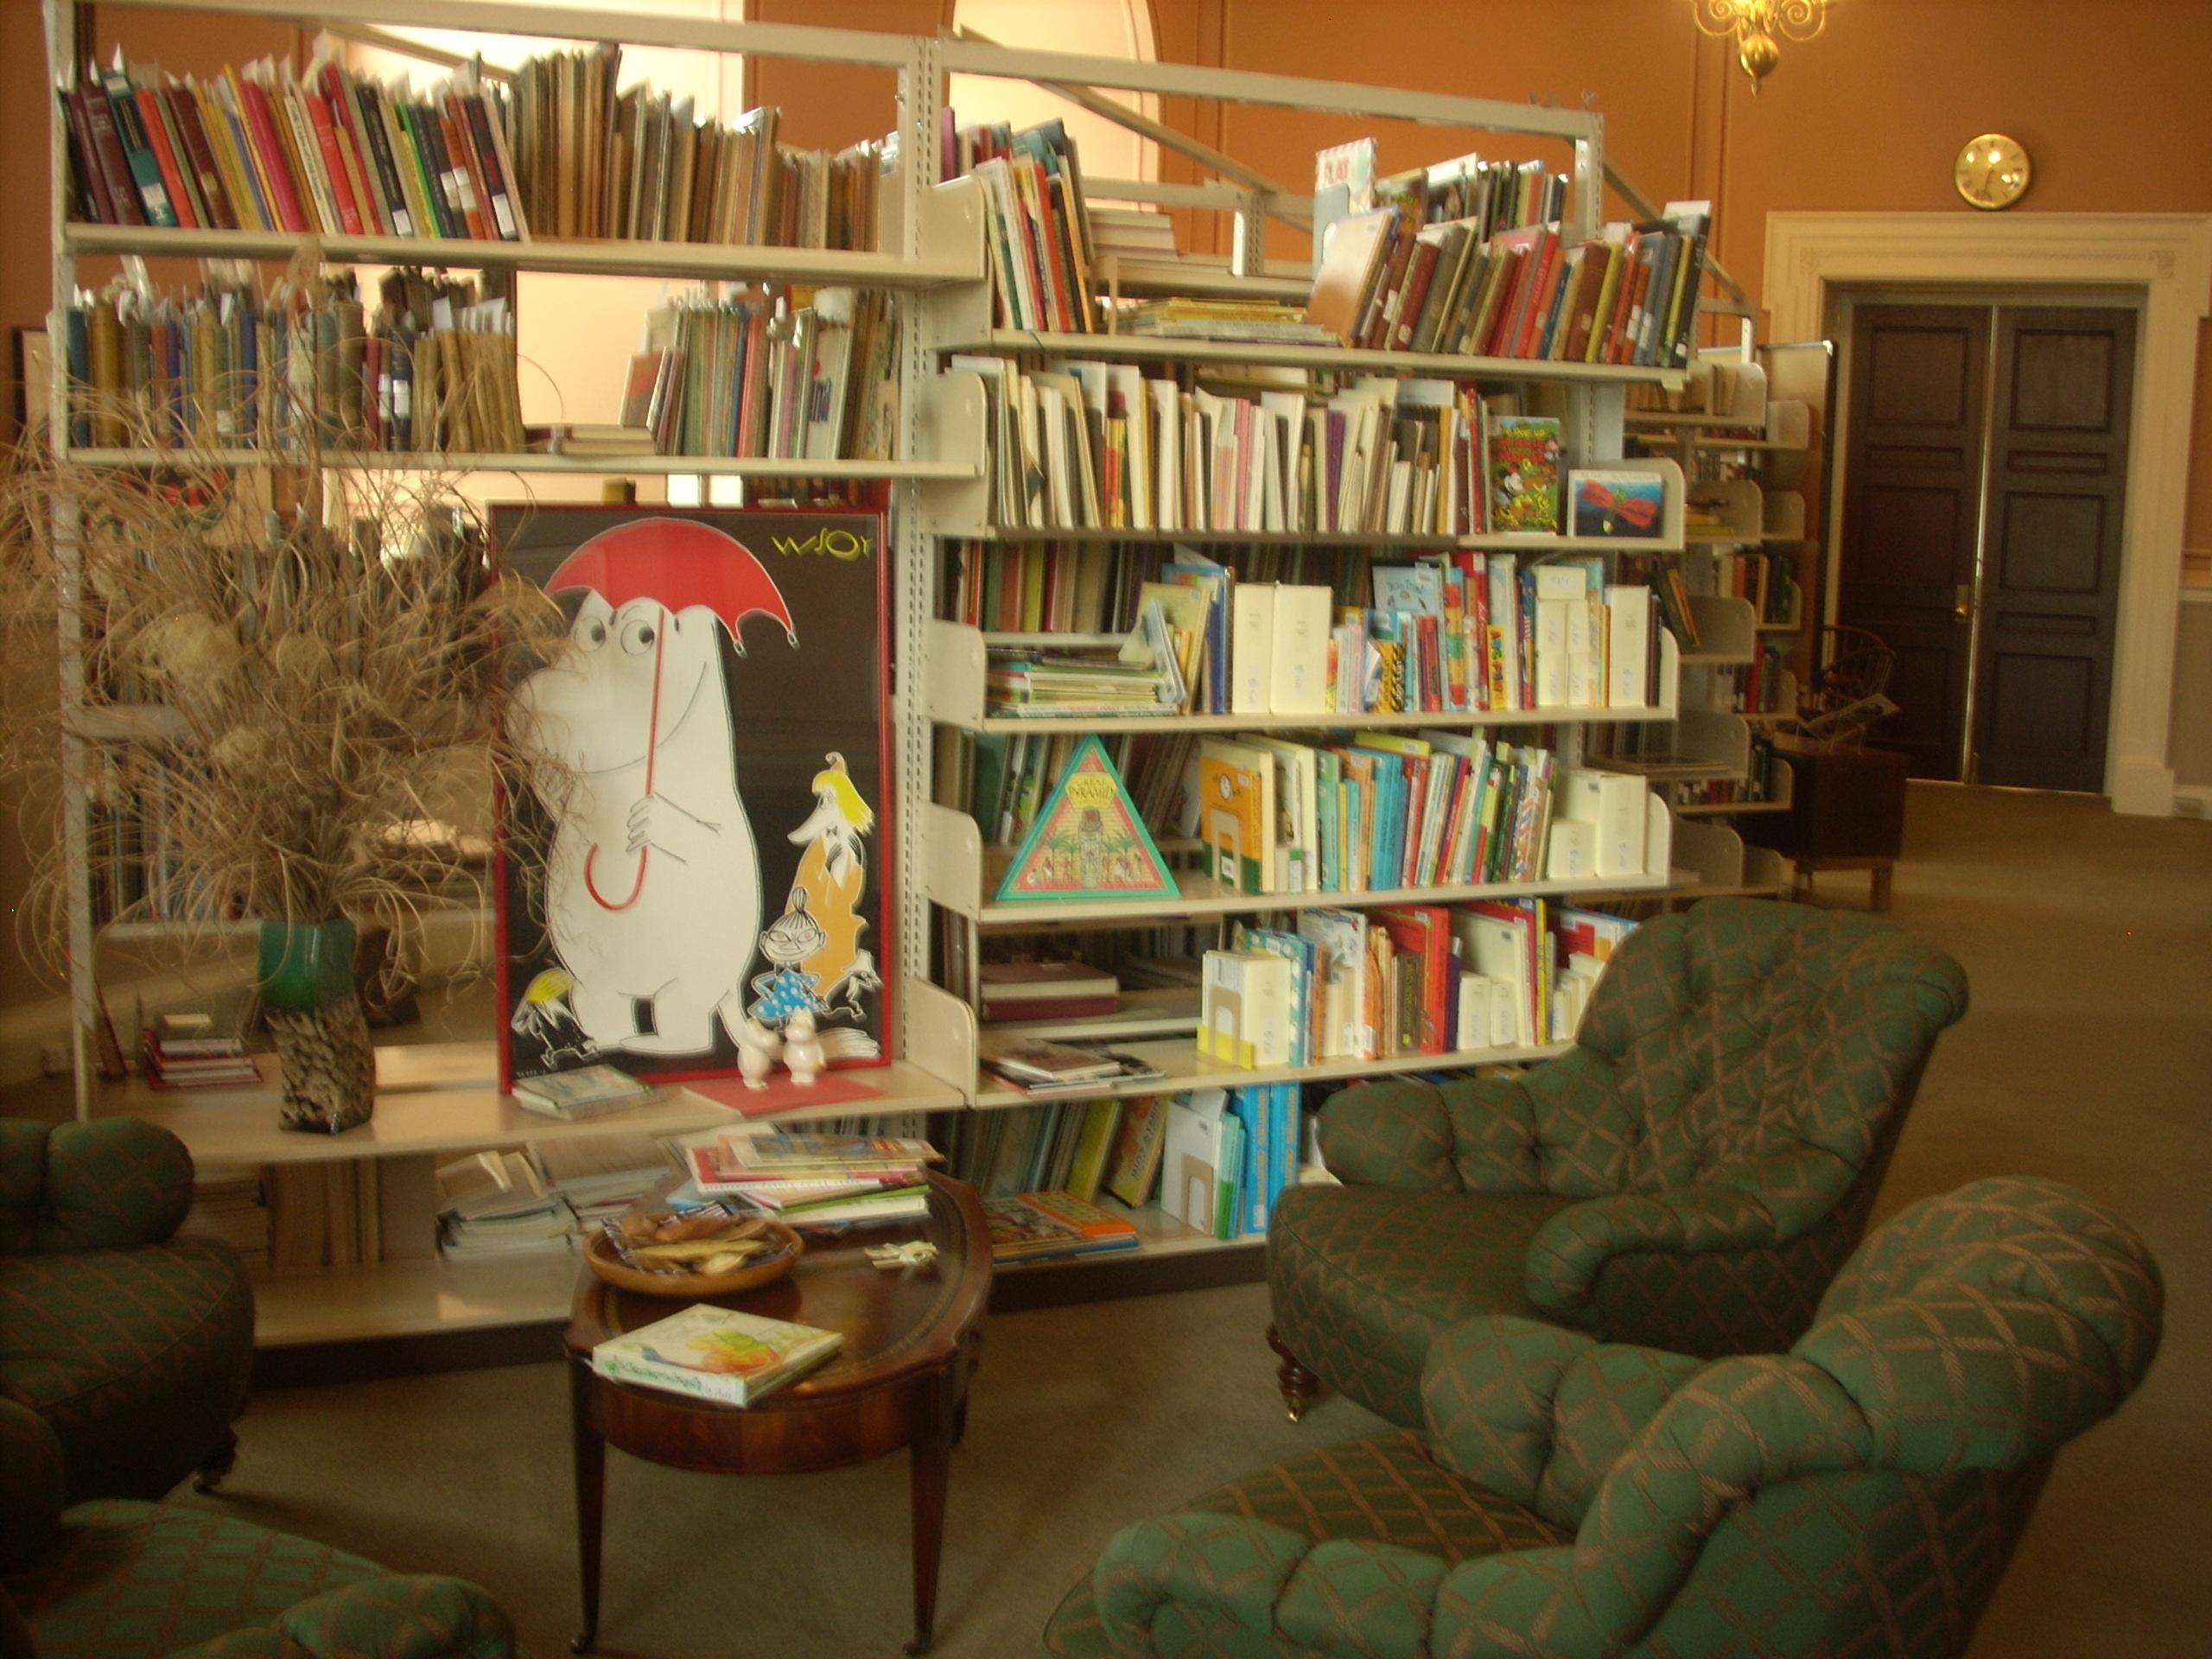 Cozy in the Children's Literature Center